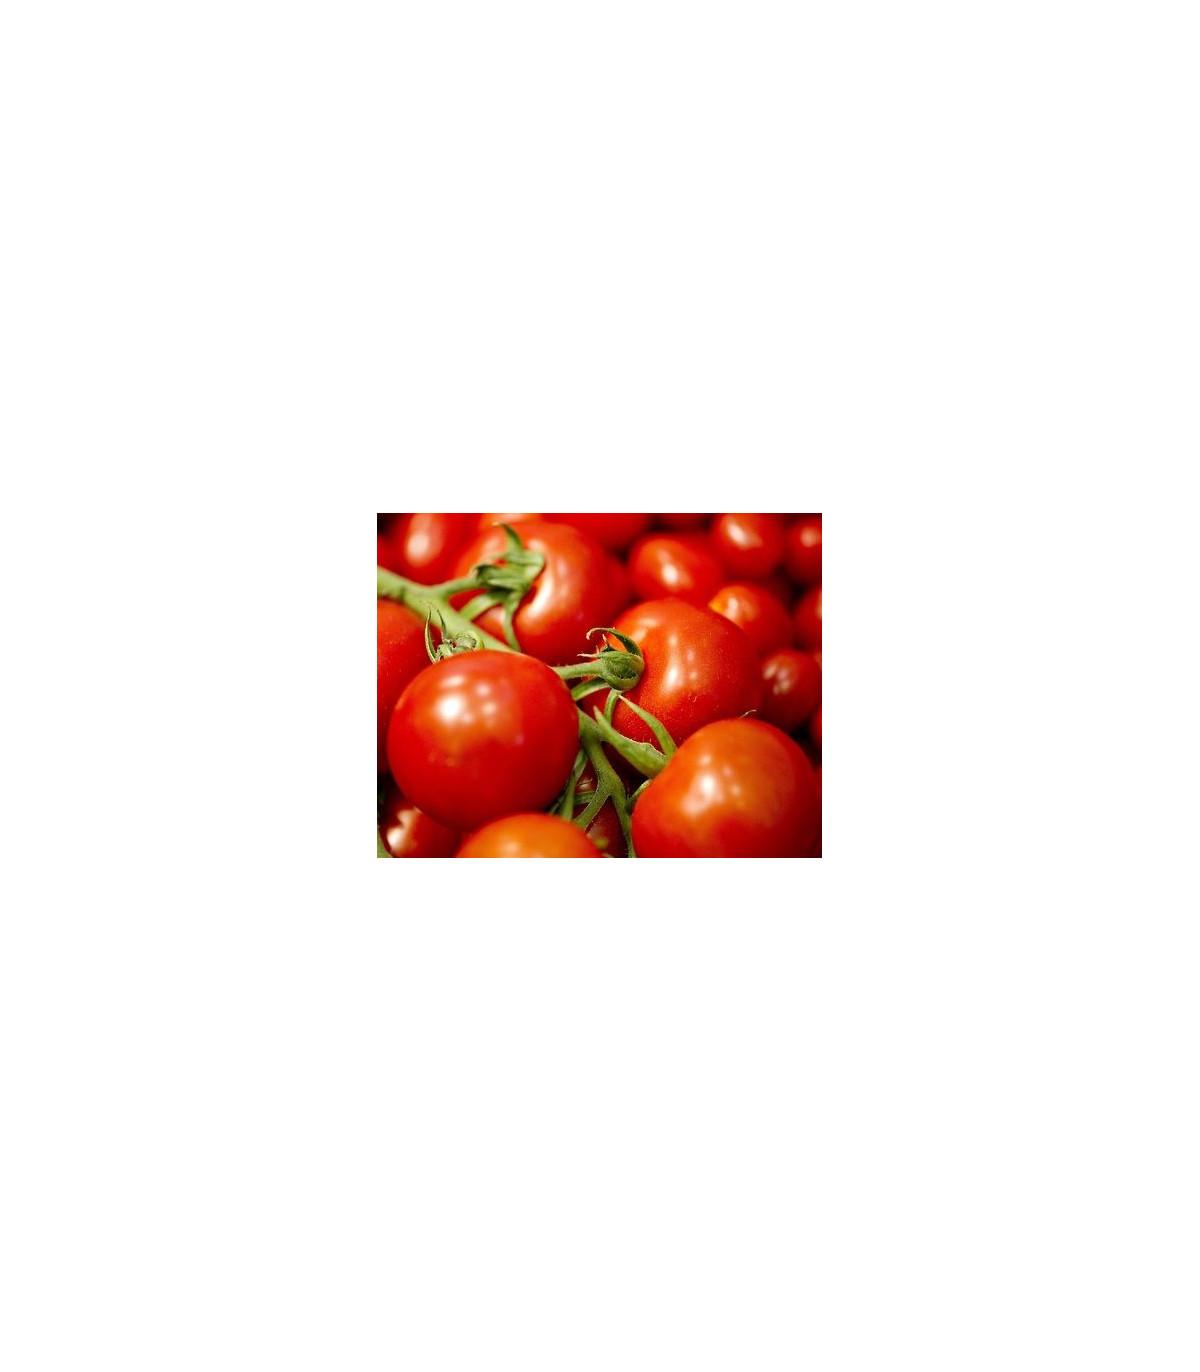 Paradajka Mercedes F1 - kolíková paradajka - Lycopersicon lycopersicum - predaj semien - 5 ks